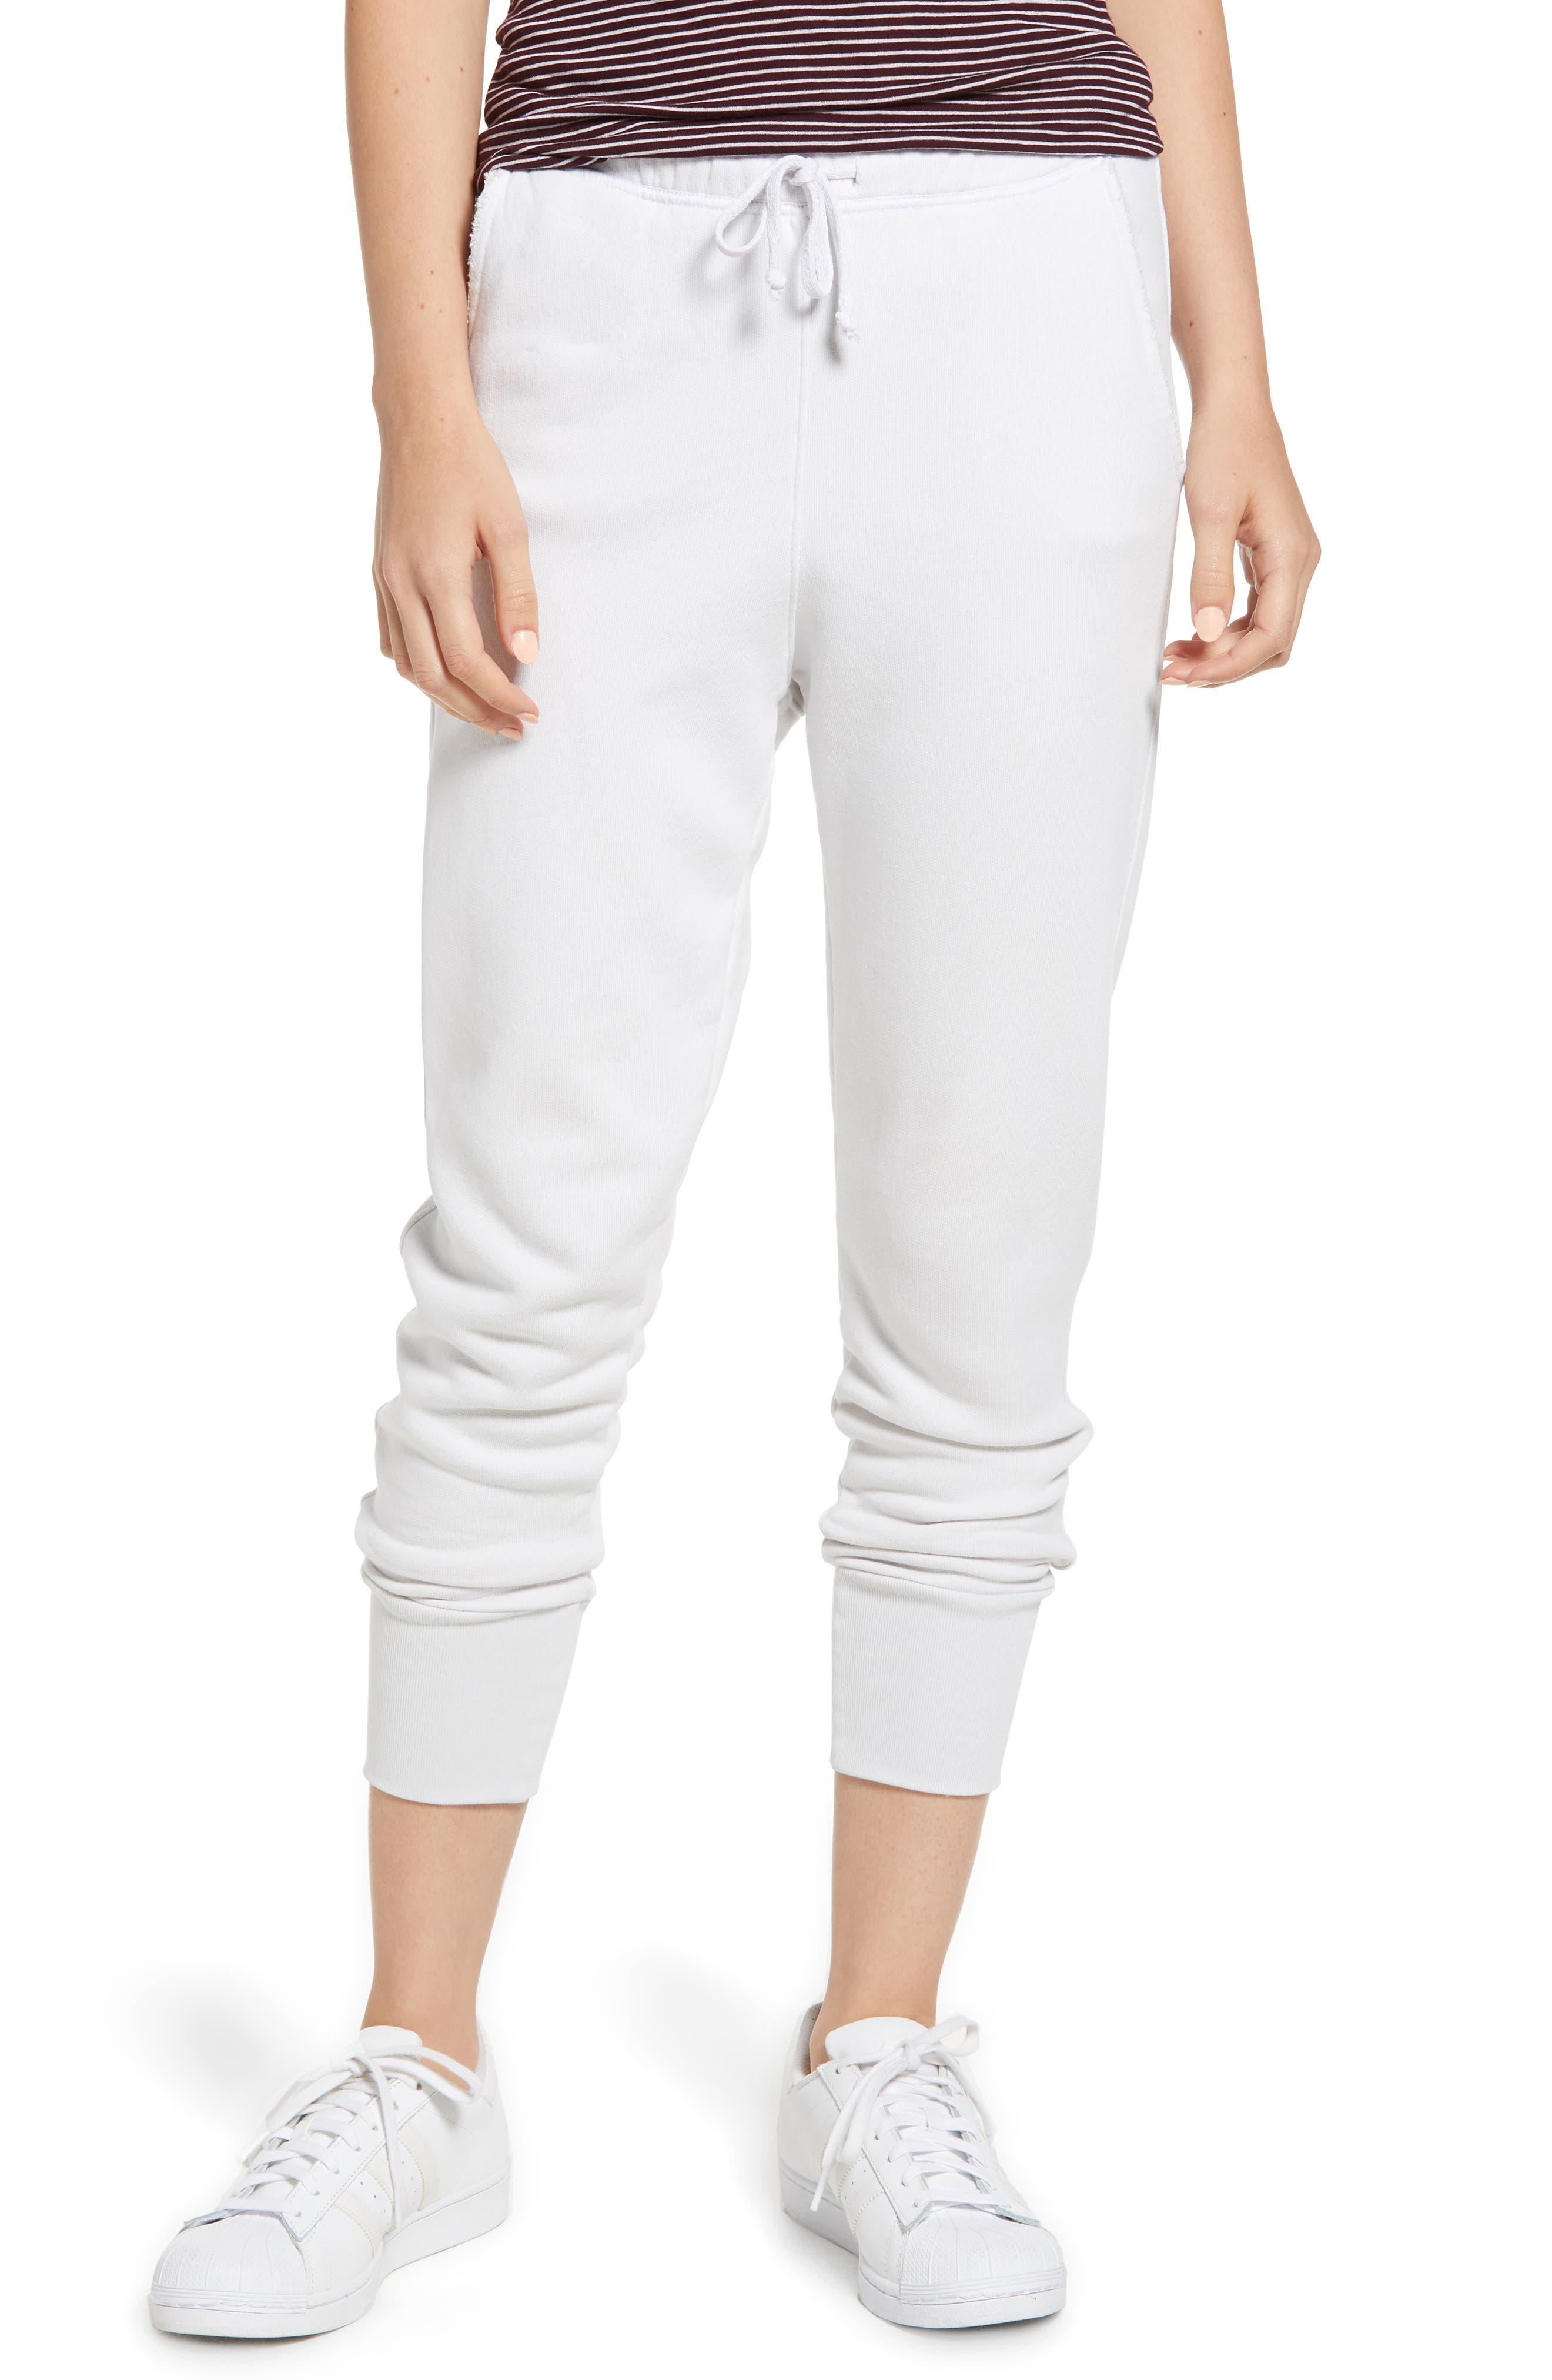 Cotton Fleece Cuffed Jogger Sweatpants in Dirty White